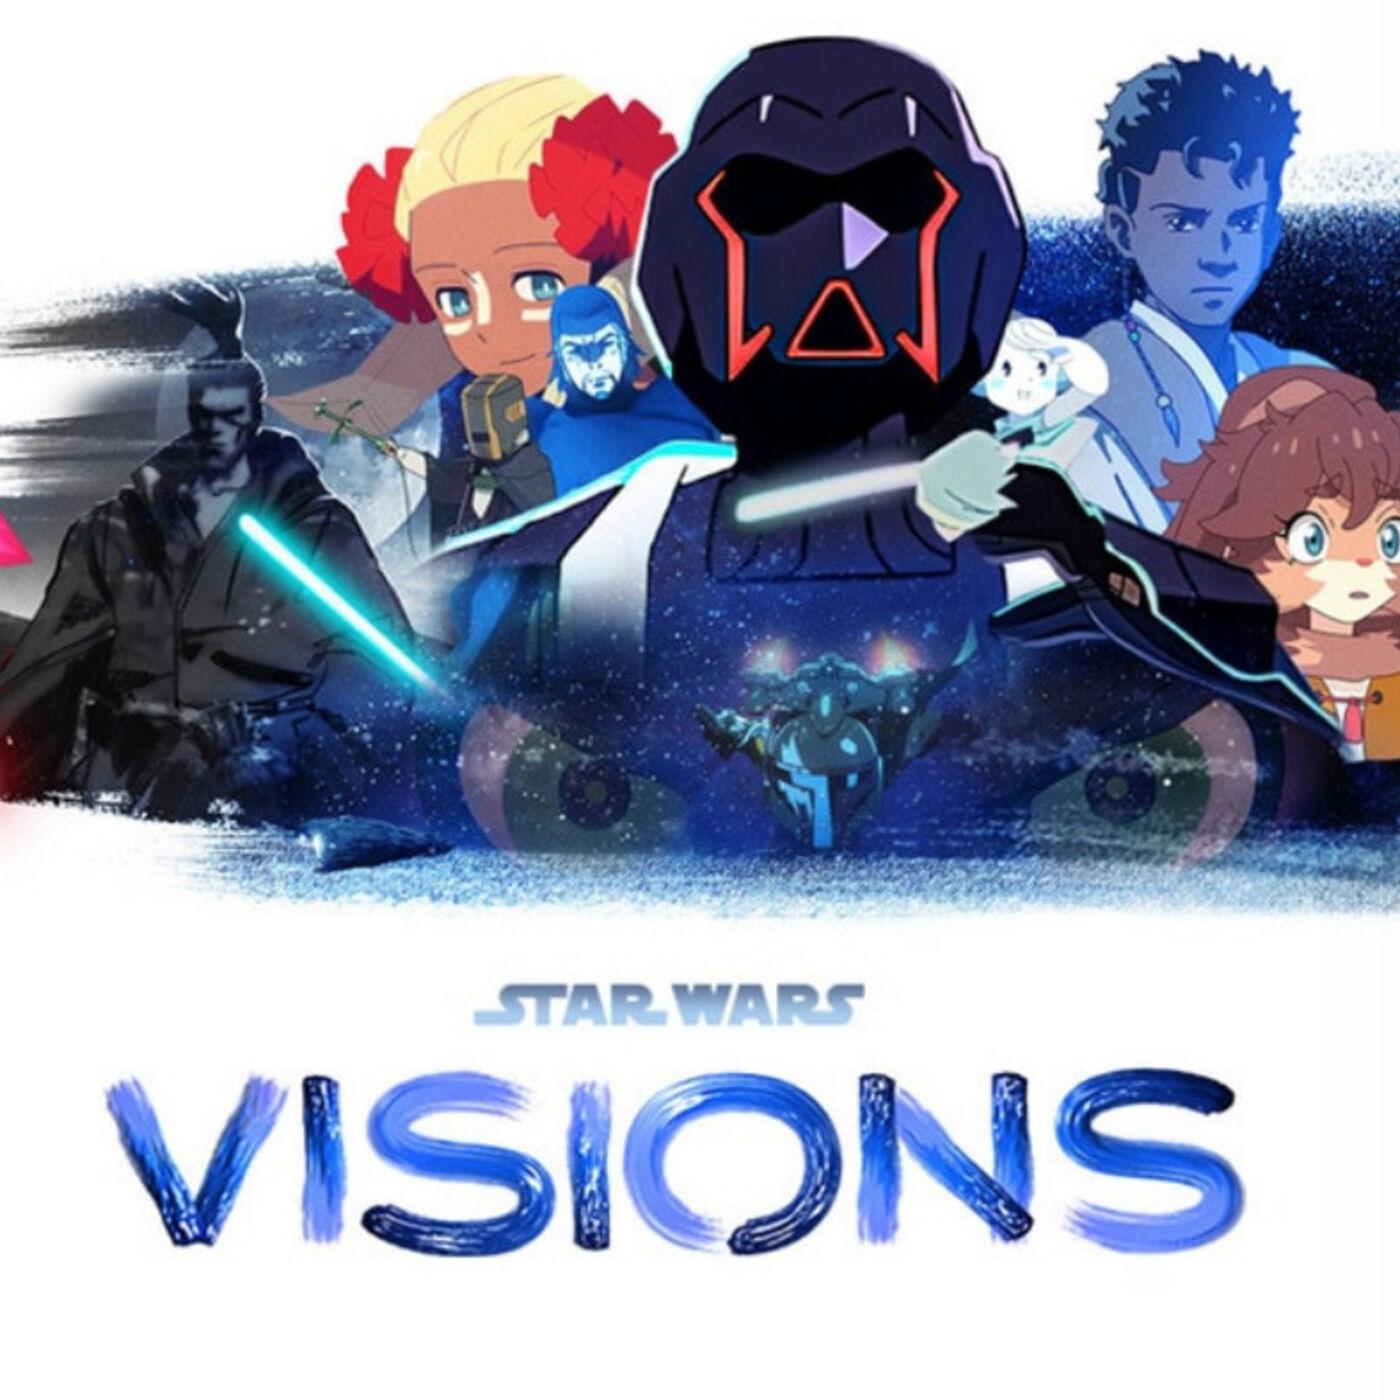 Star Wars: Visions (Spoiler Free Review)